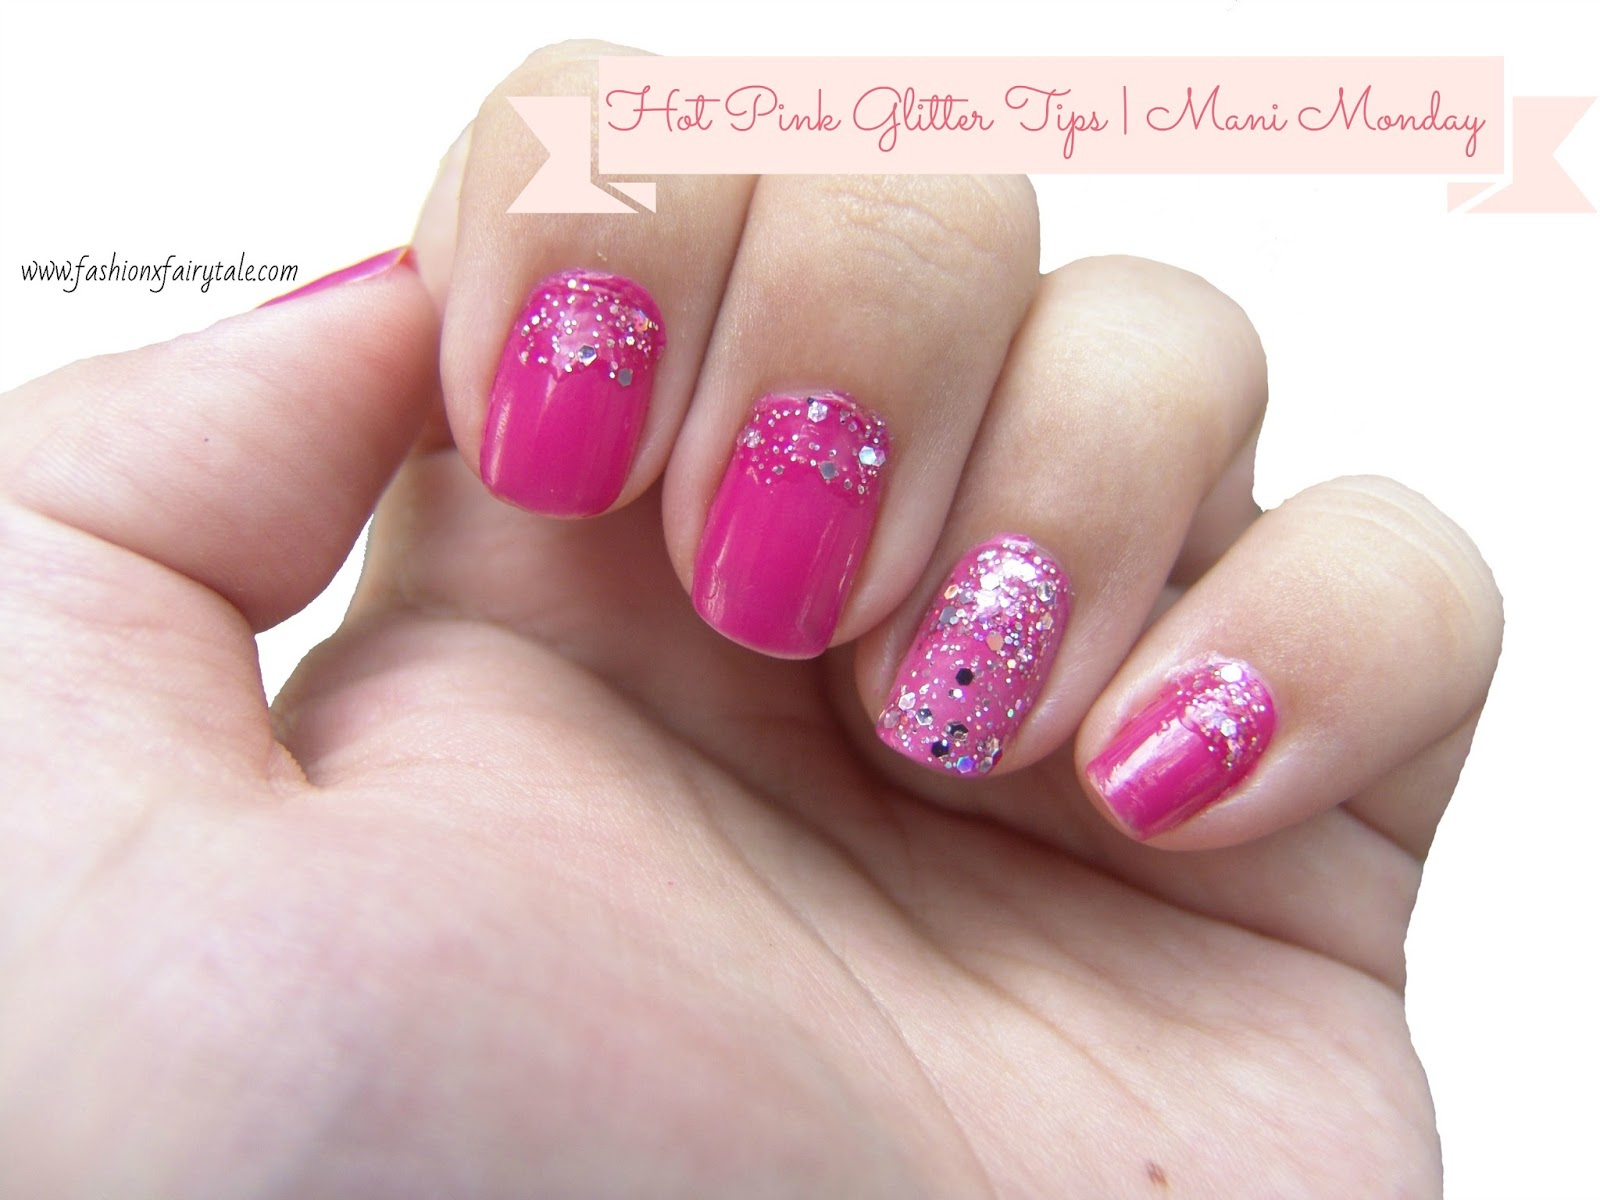 Hot Pink Glitter Tips | Manicure Monday